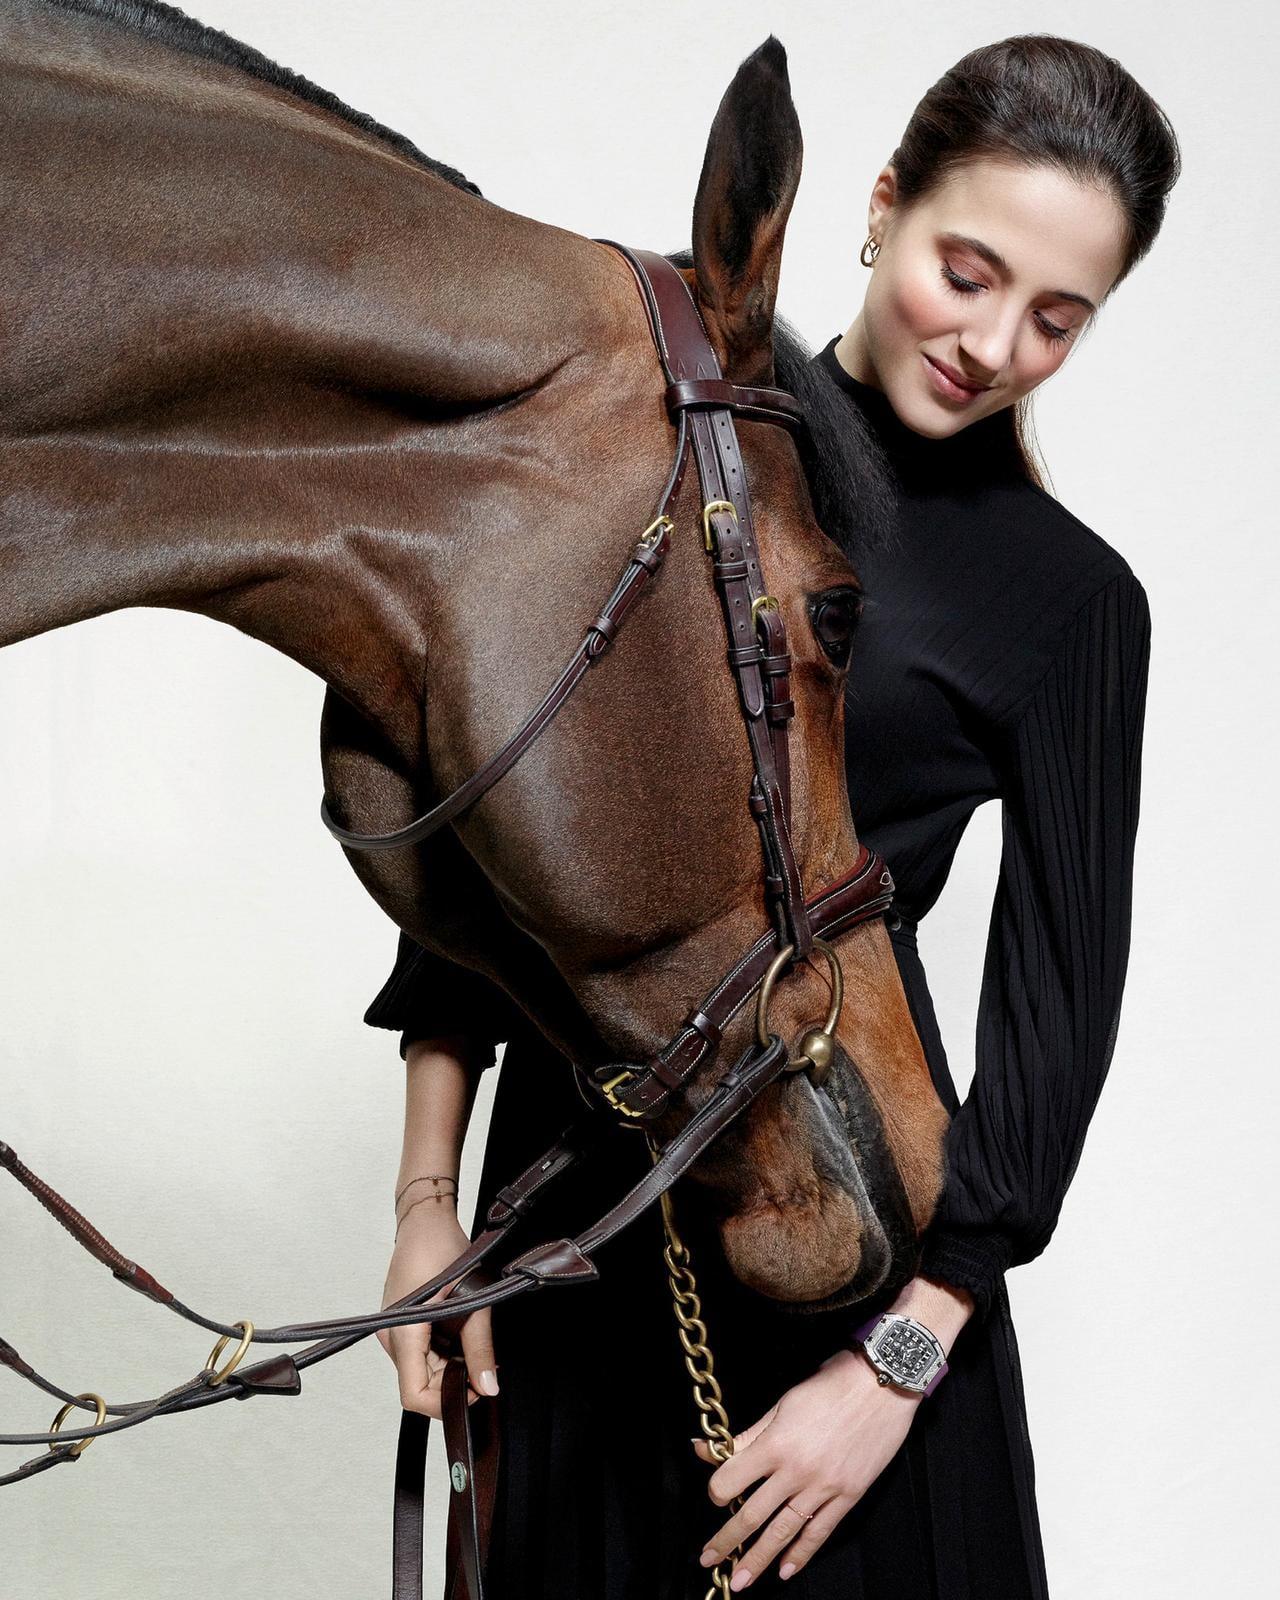 Flore Giraud sees the horse as a close friend.